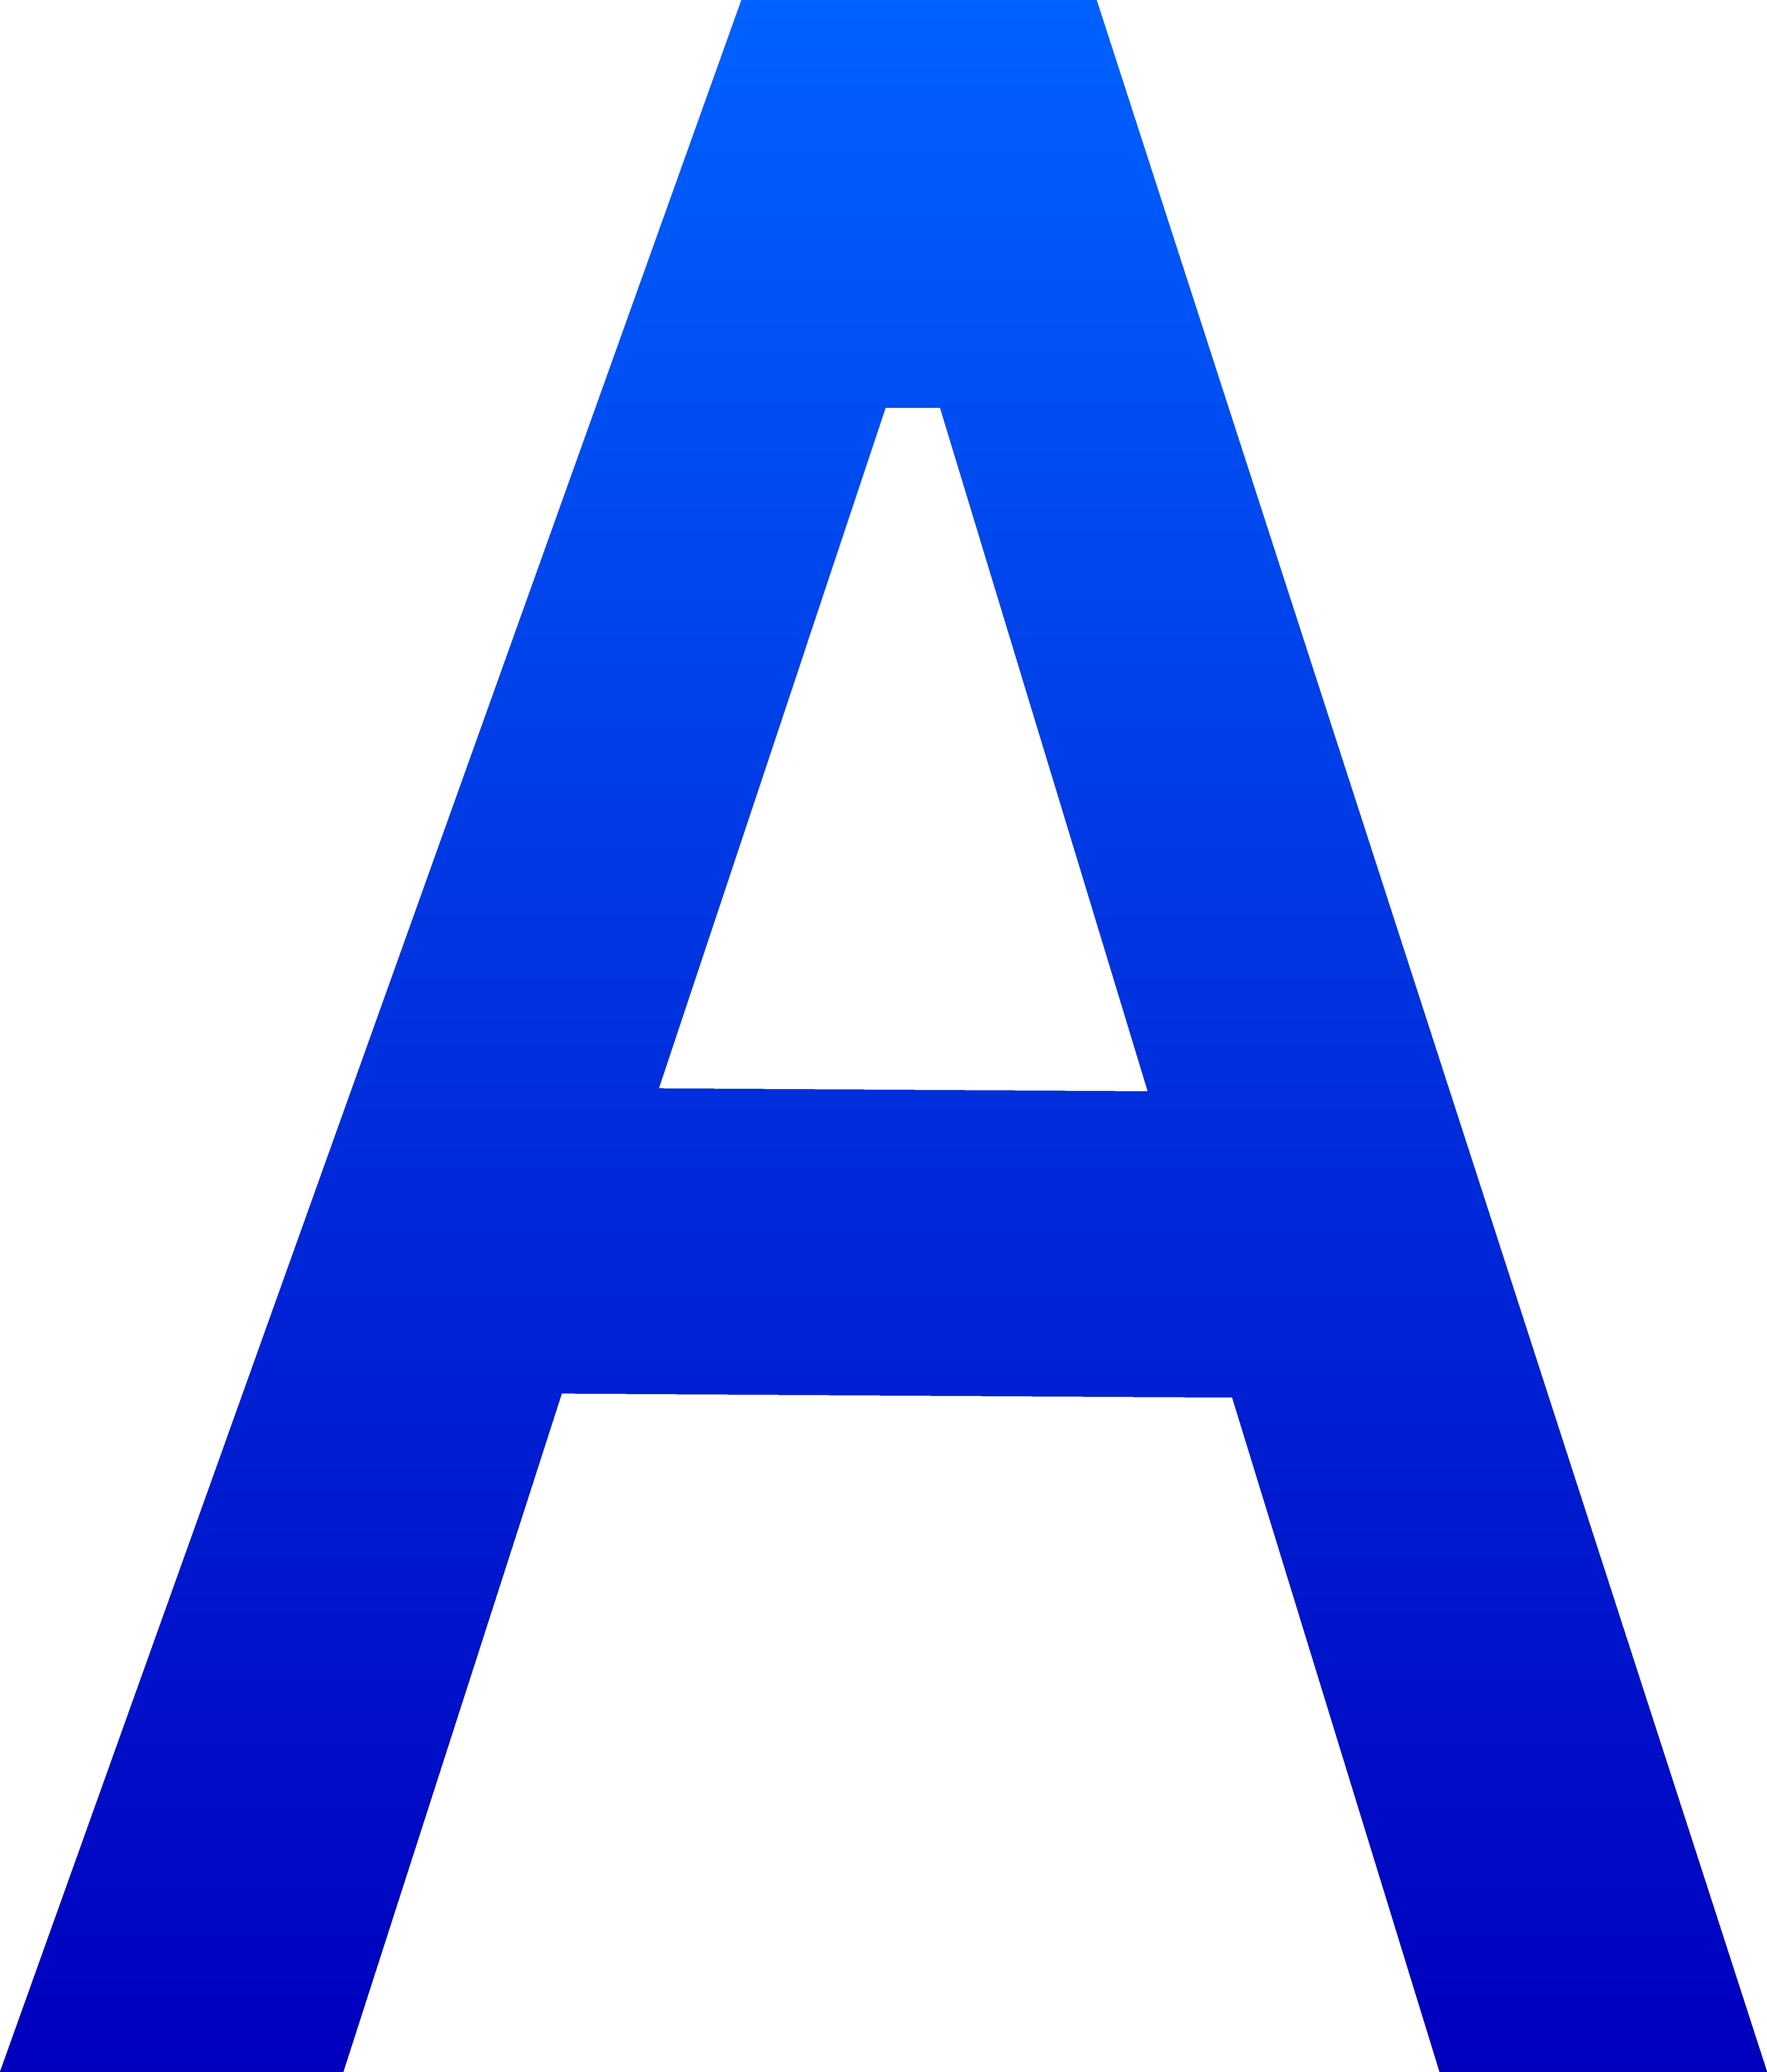 Cute Alphabet Letters Printable - WeSharePics